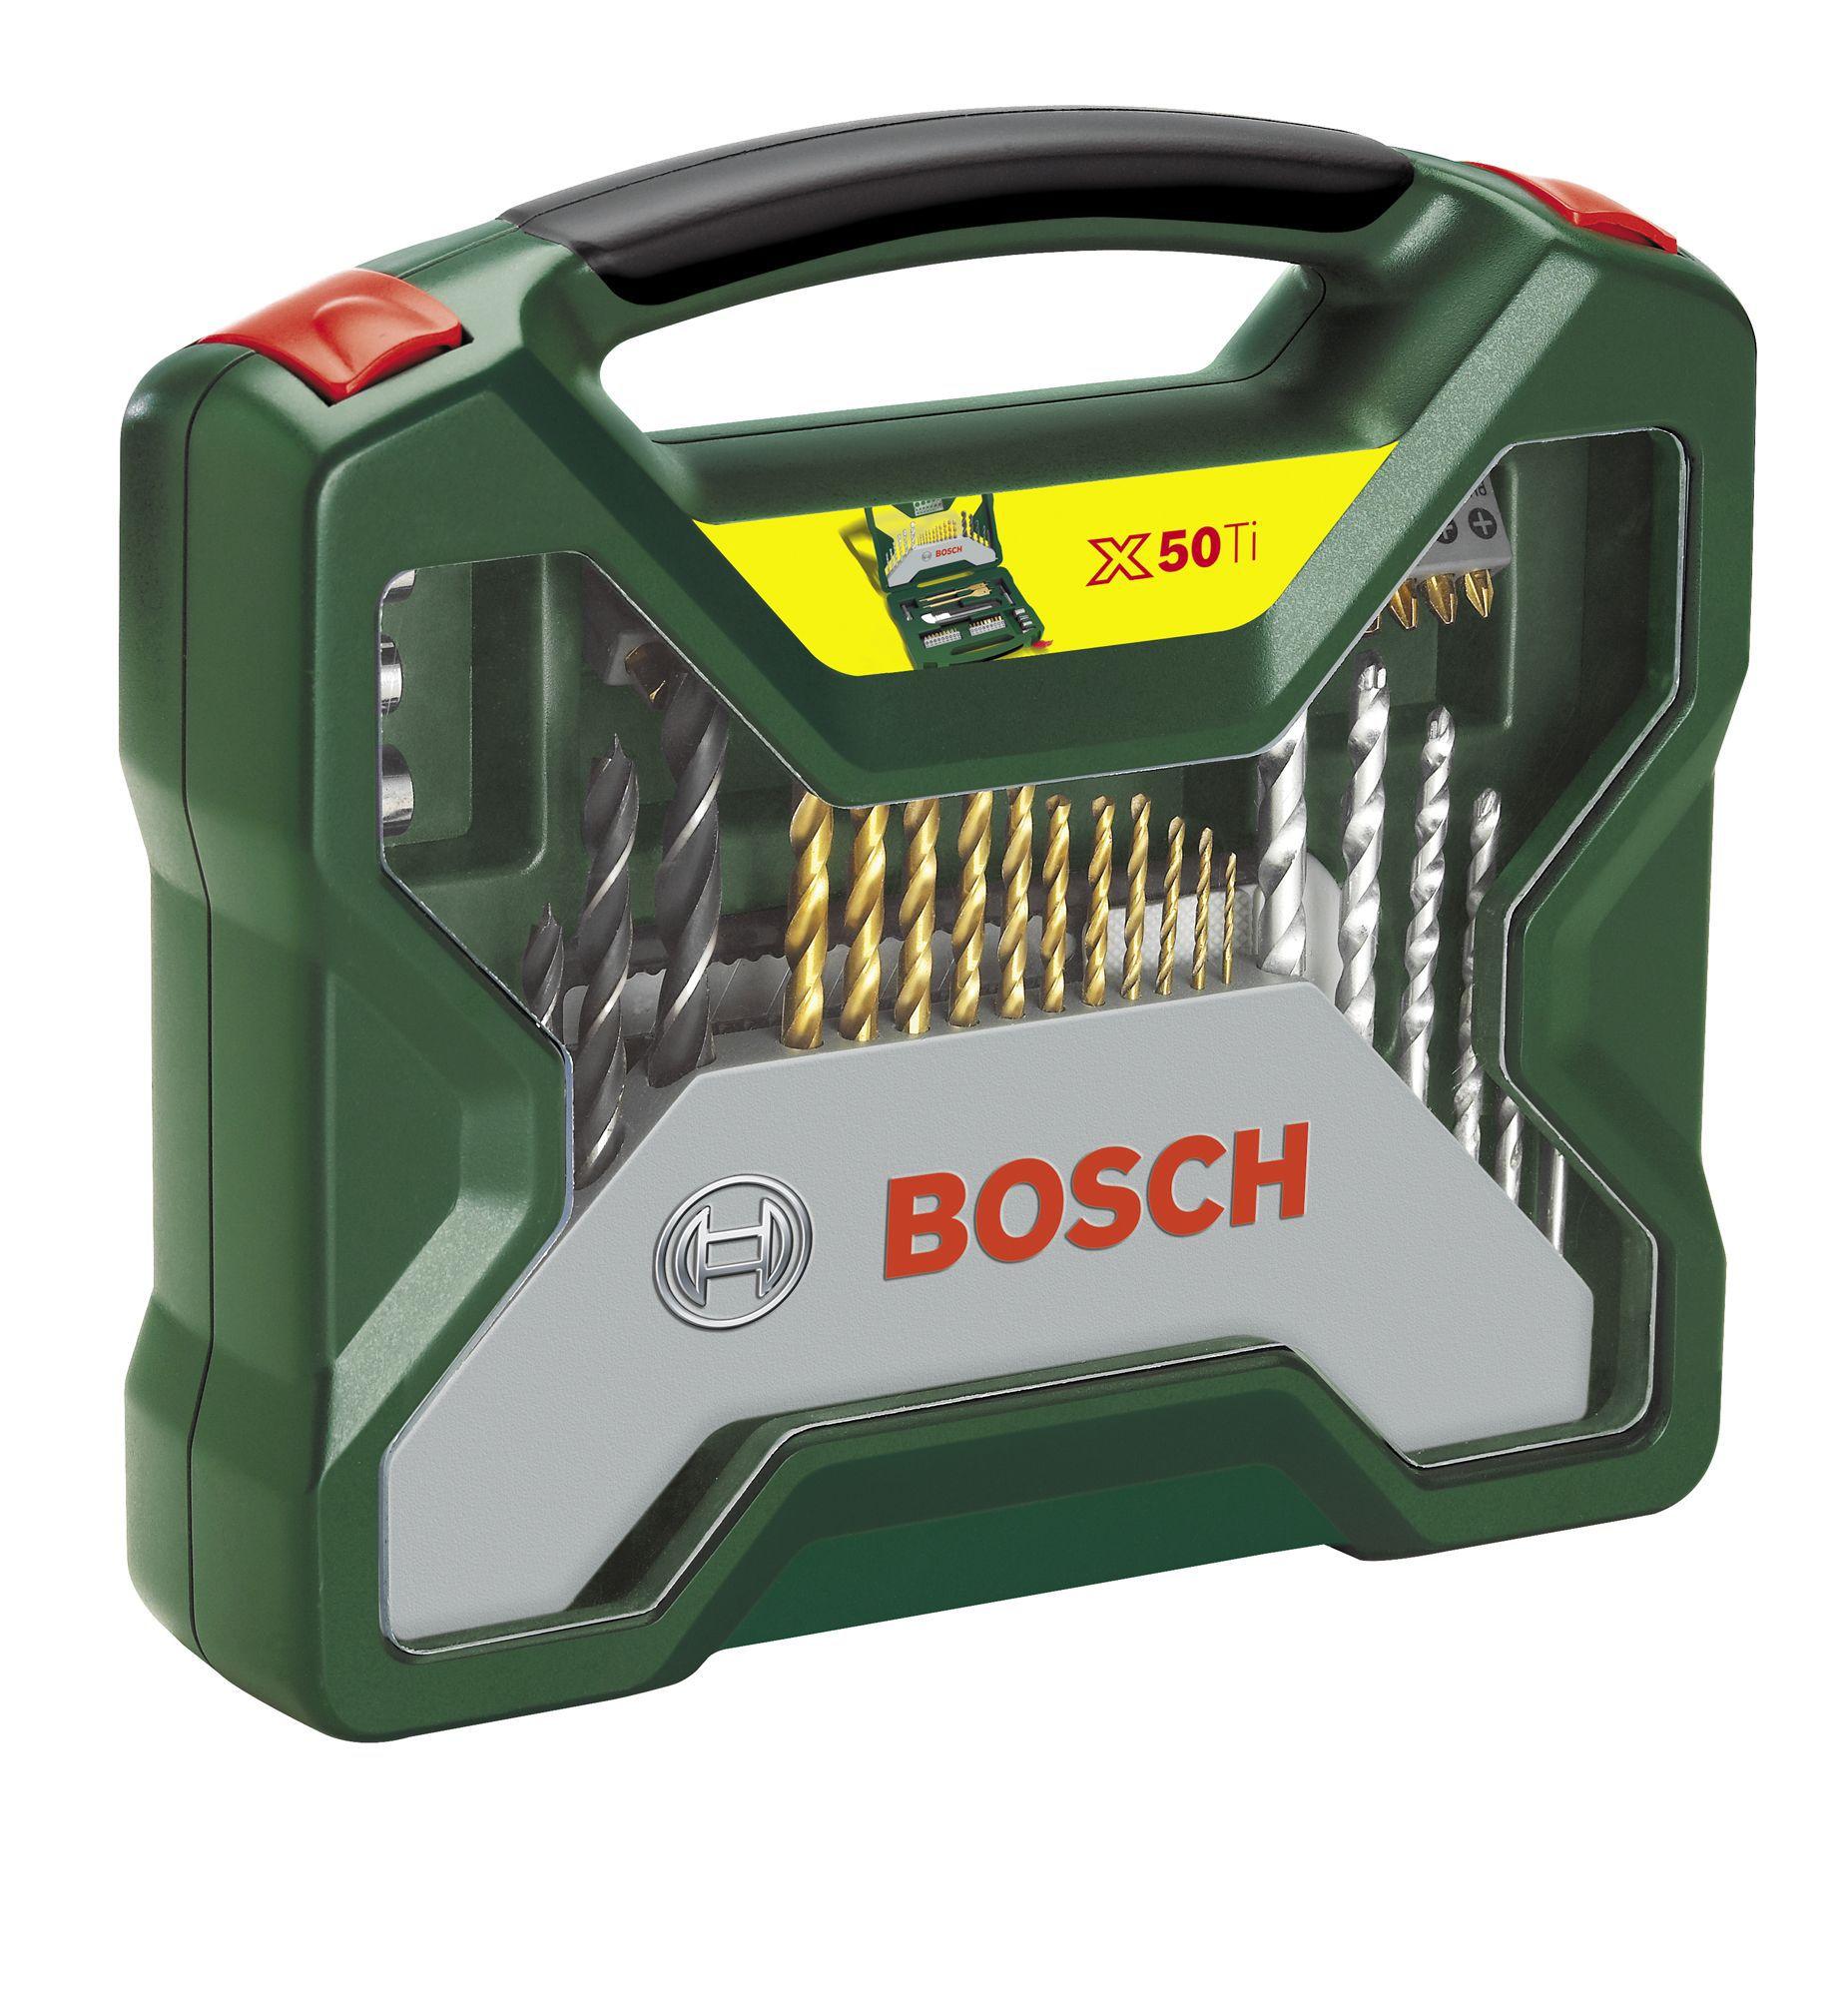 bosch x line mixed drill bit accessory set 50 piece departments diy at b q. Black Bedroom Furniture Sets. Home Design Ideas